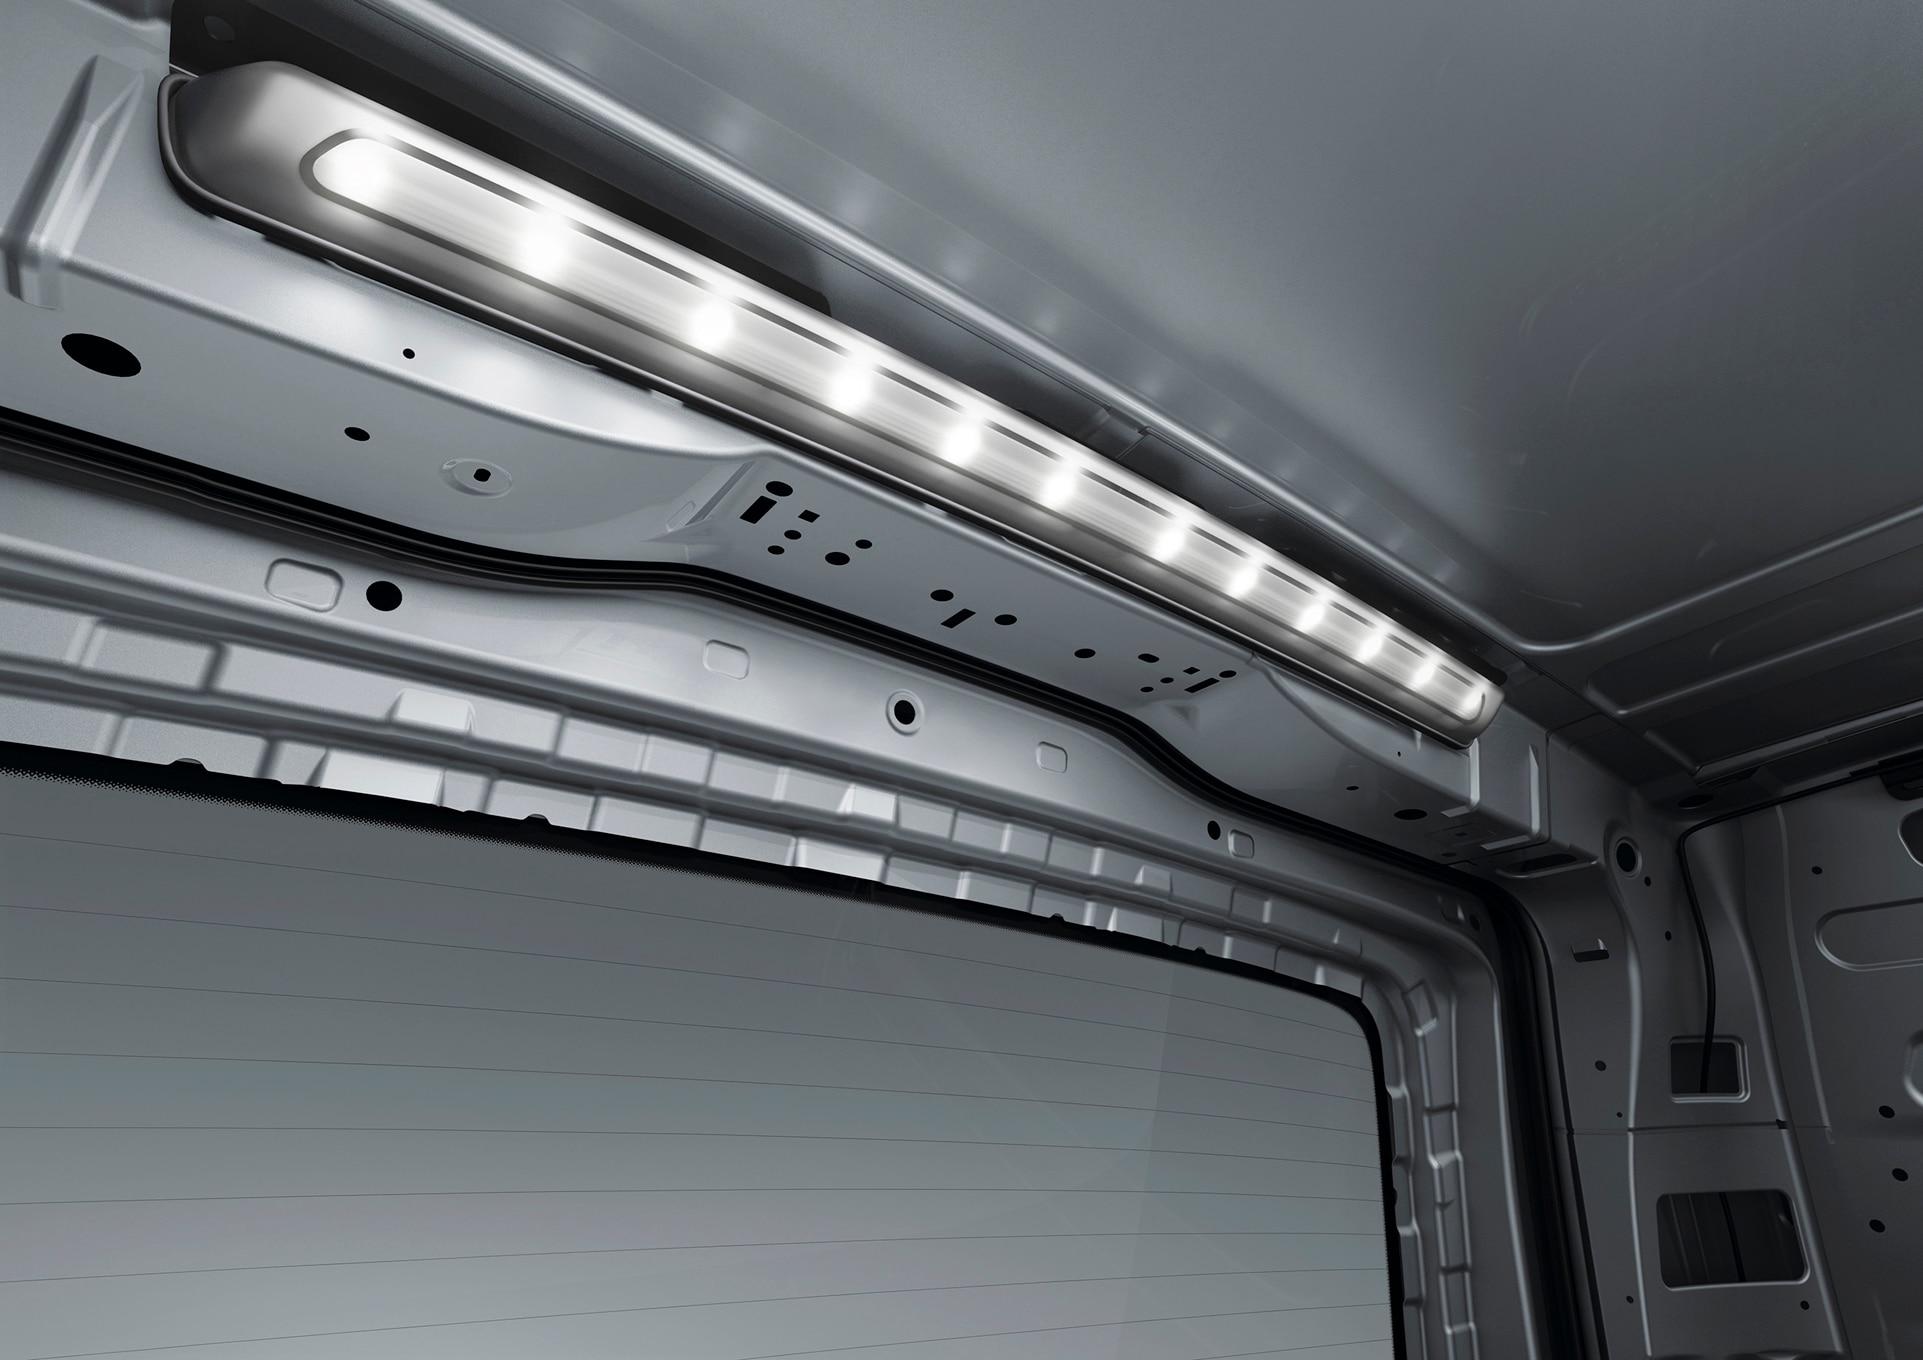 2016 mercedes benz metris commercial van detailed - Mercedes sprinter interior light ...